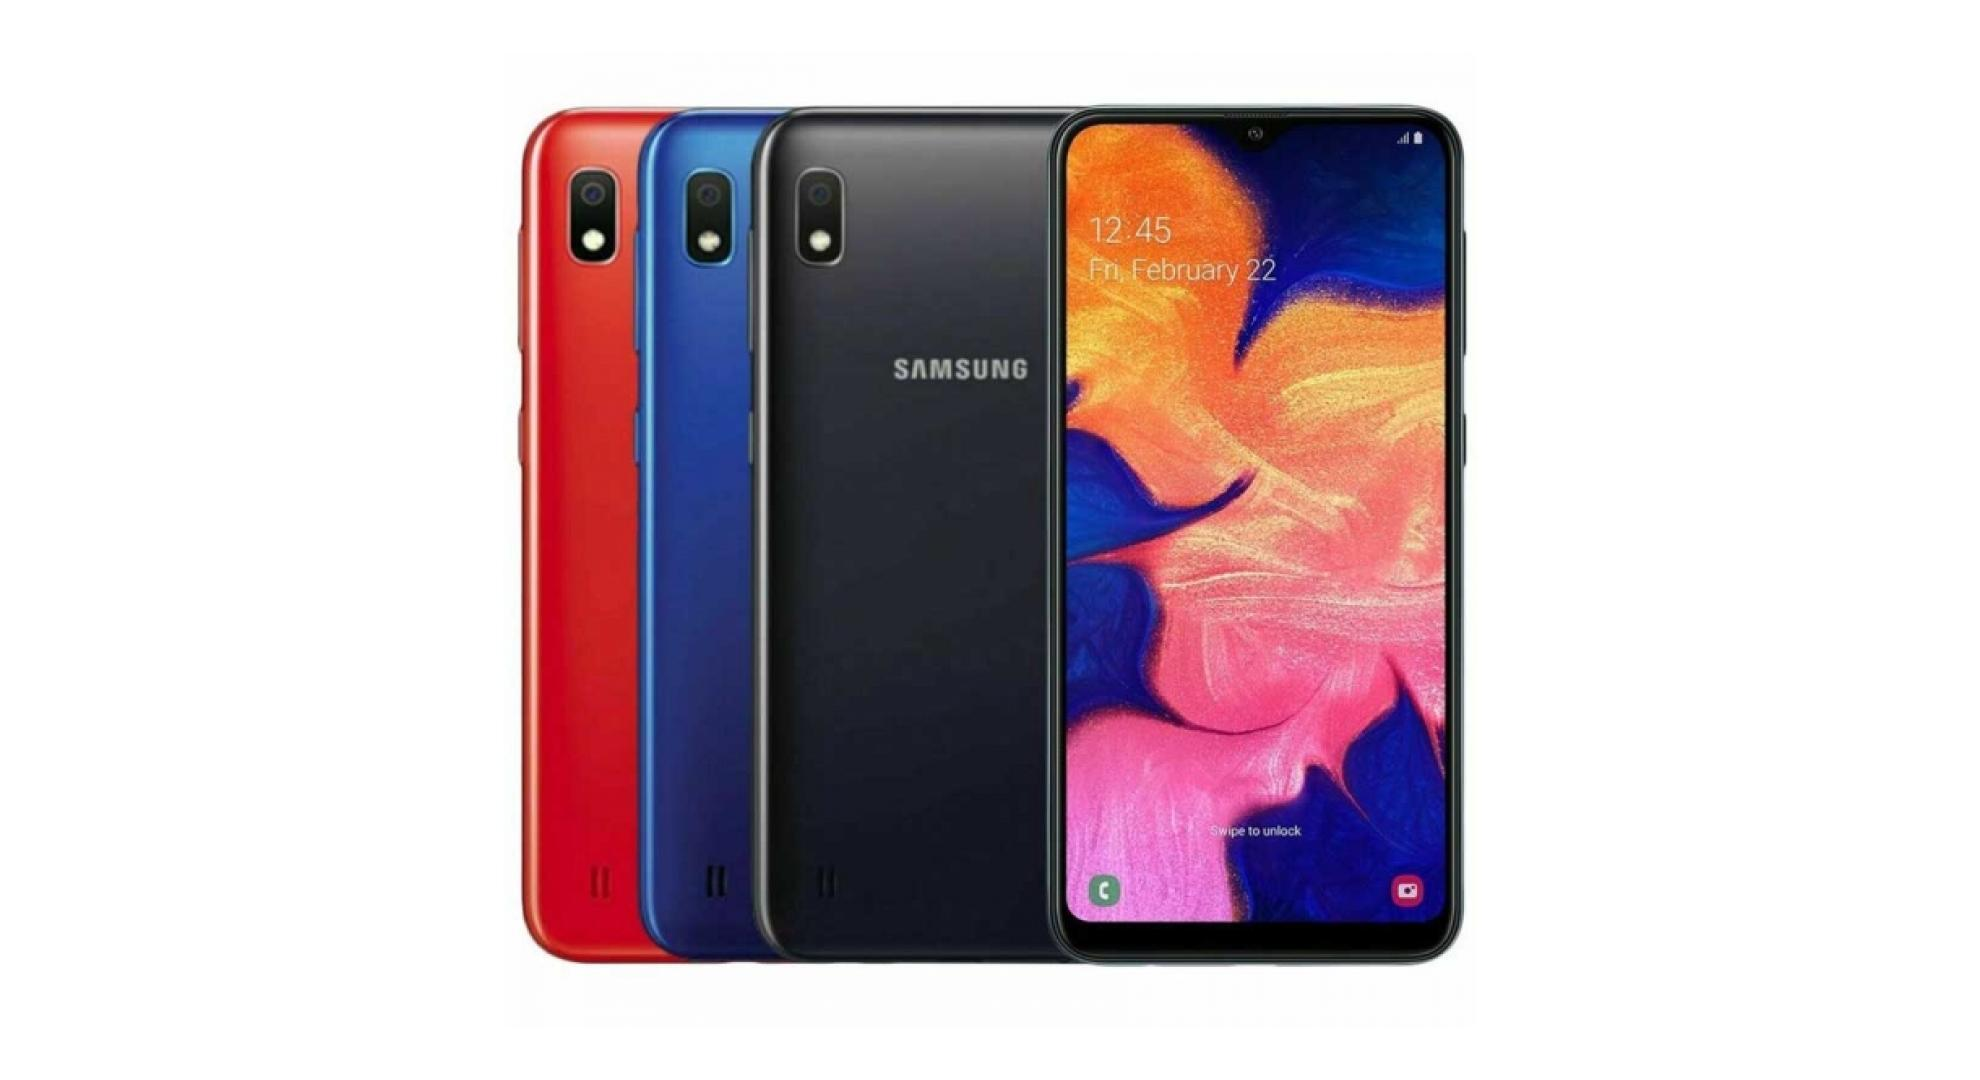 Où acheter le Samsung Galaxy A10 au meilleur prix en 2019 ?